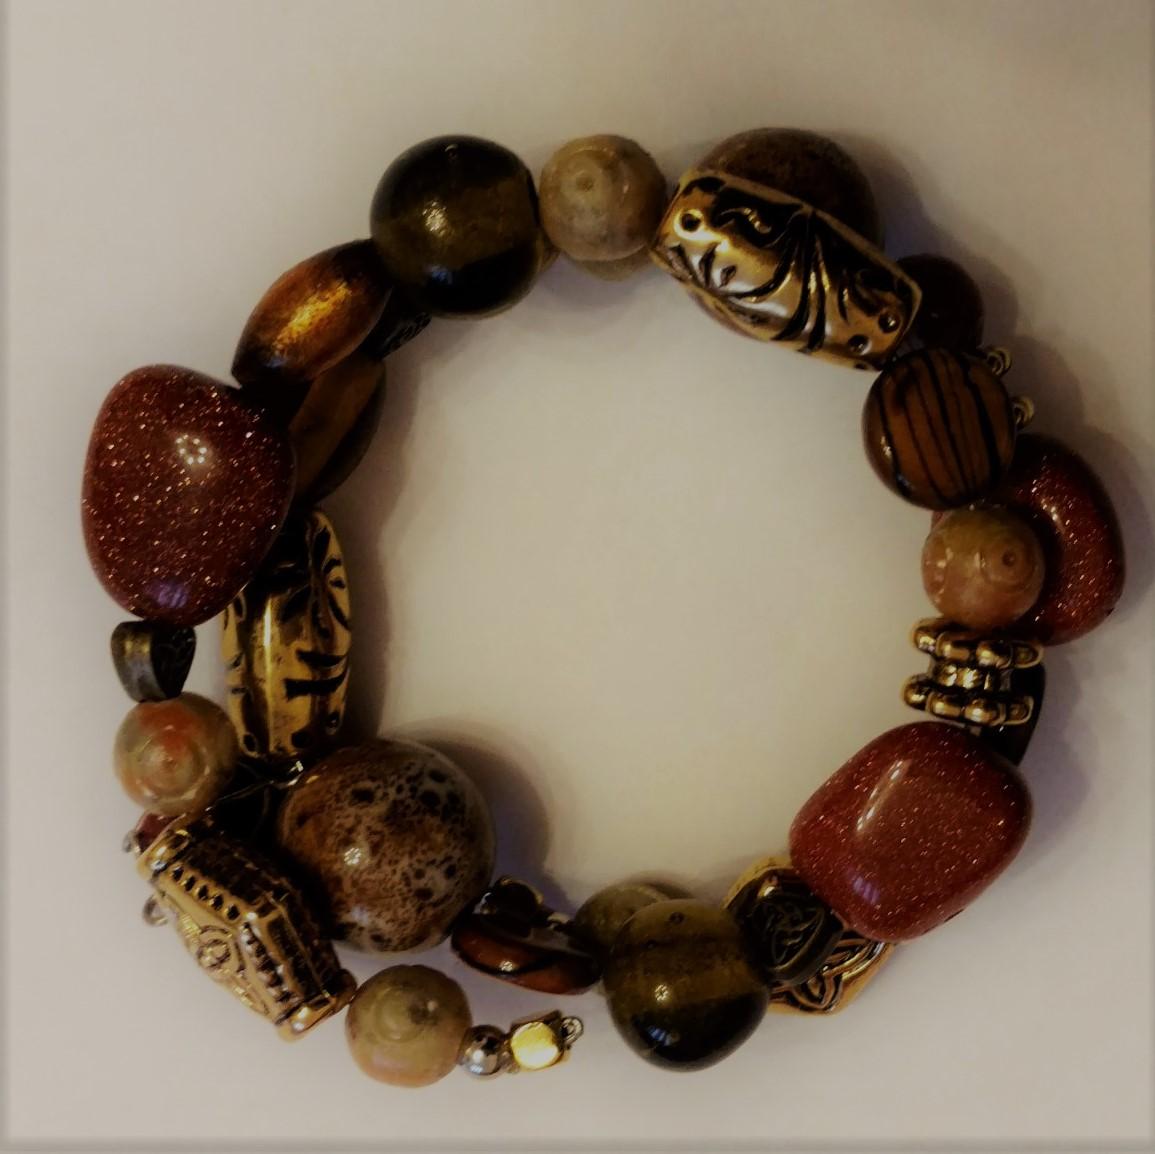 #L&L 181212 Bracelet  Suggested $25 USD